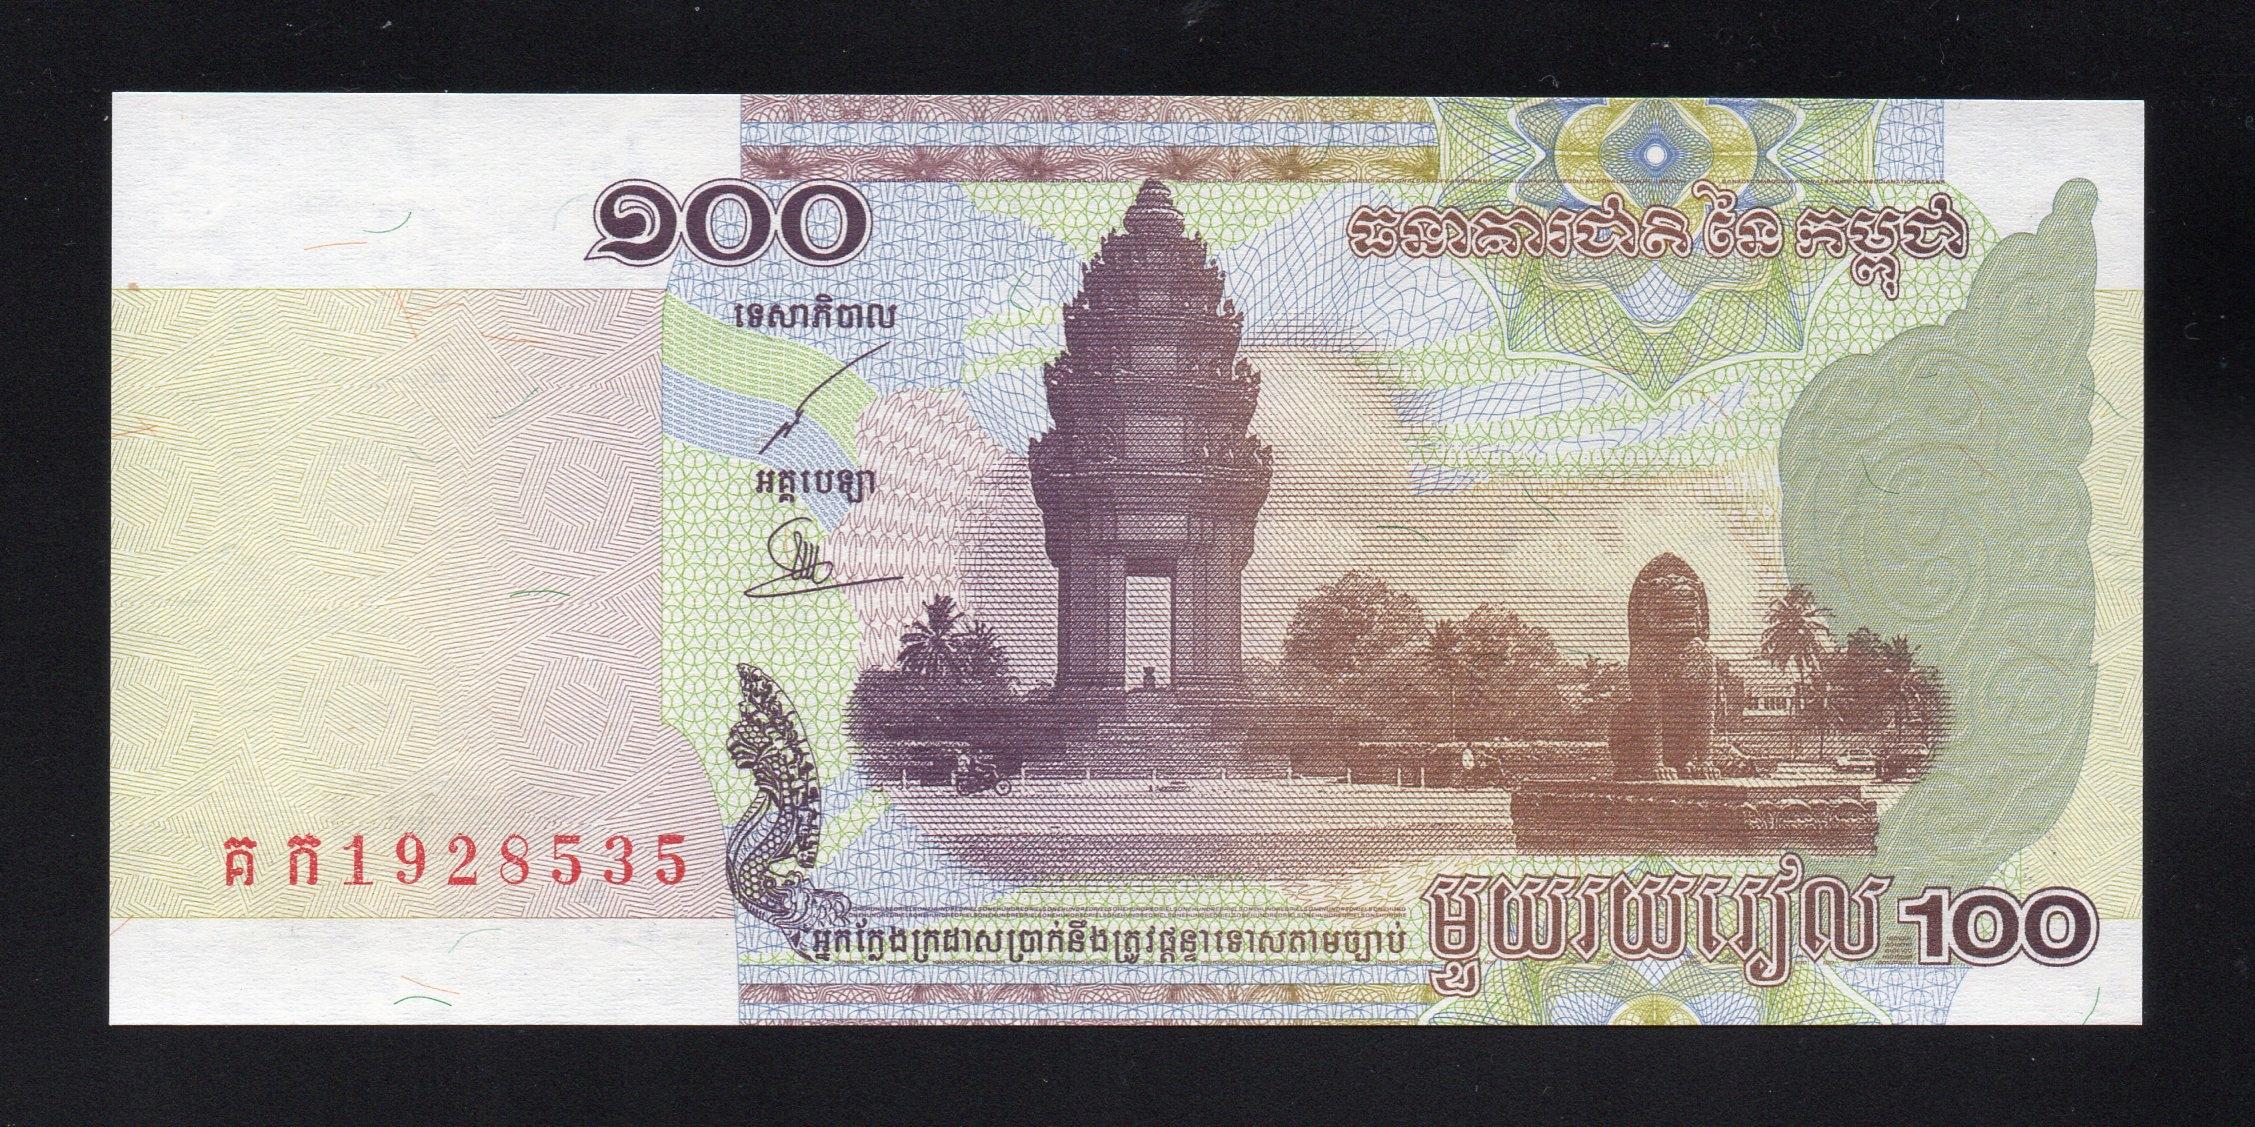 Камбоджа 100 RIELS P-53 UNC 2001